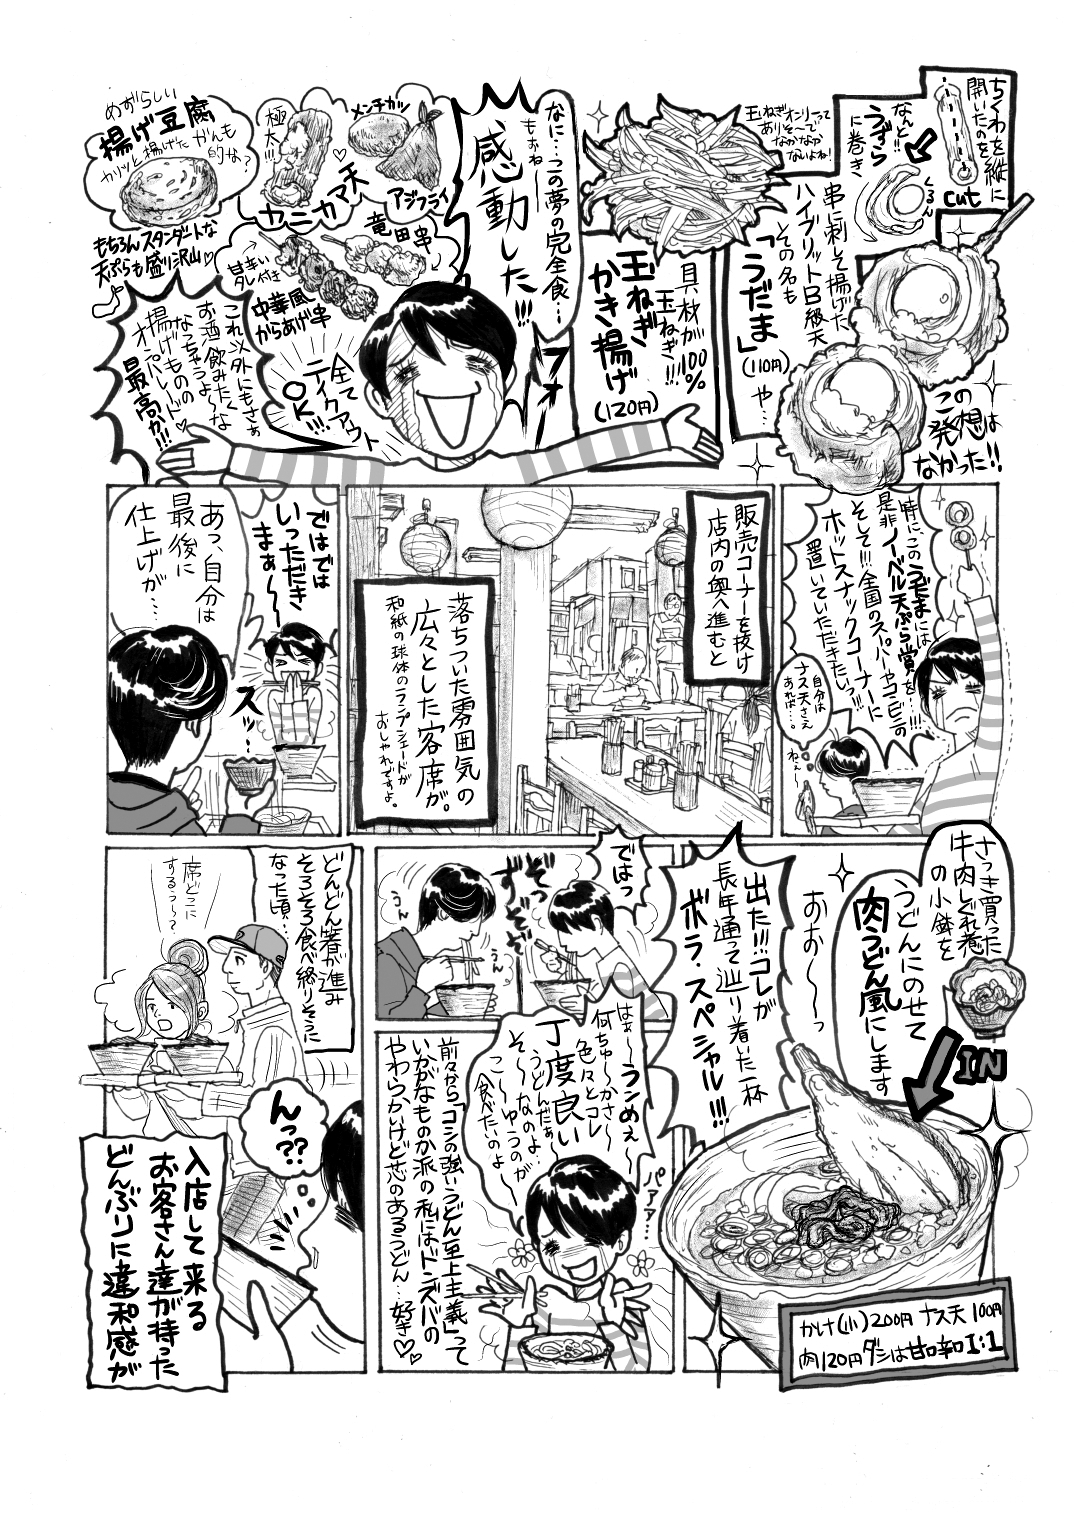 udon_3.jpg